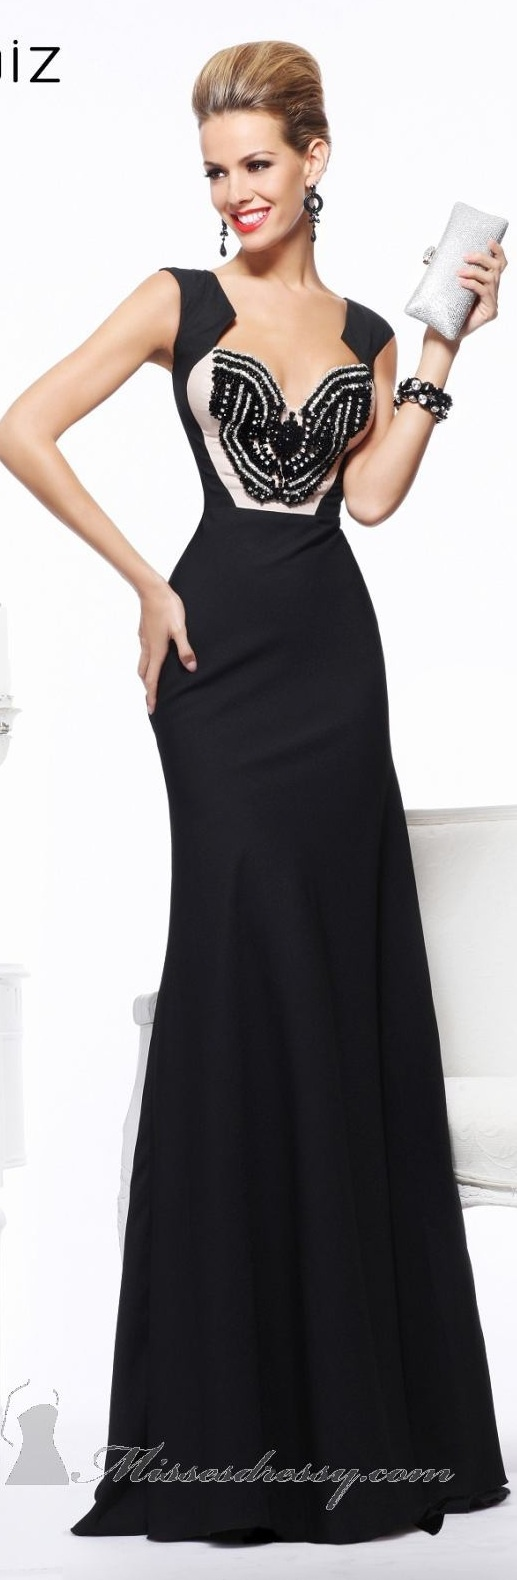 Tarik ediz couture fashion pinterest couture gowns and formal